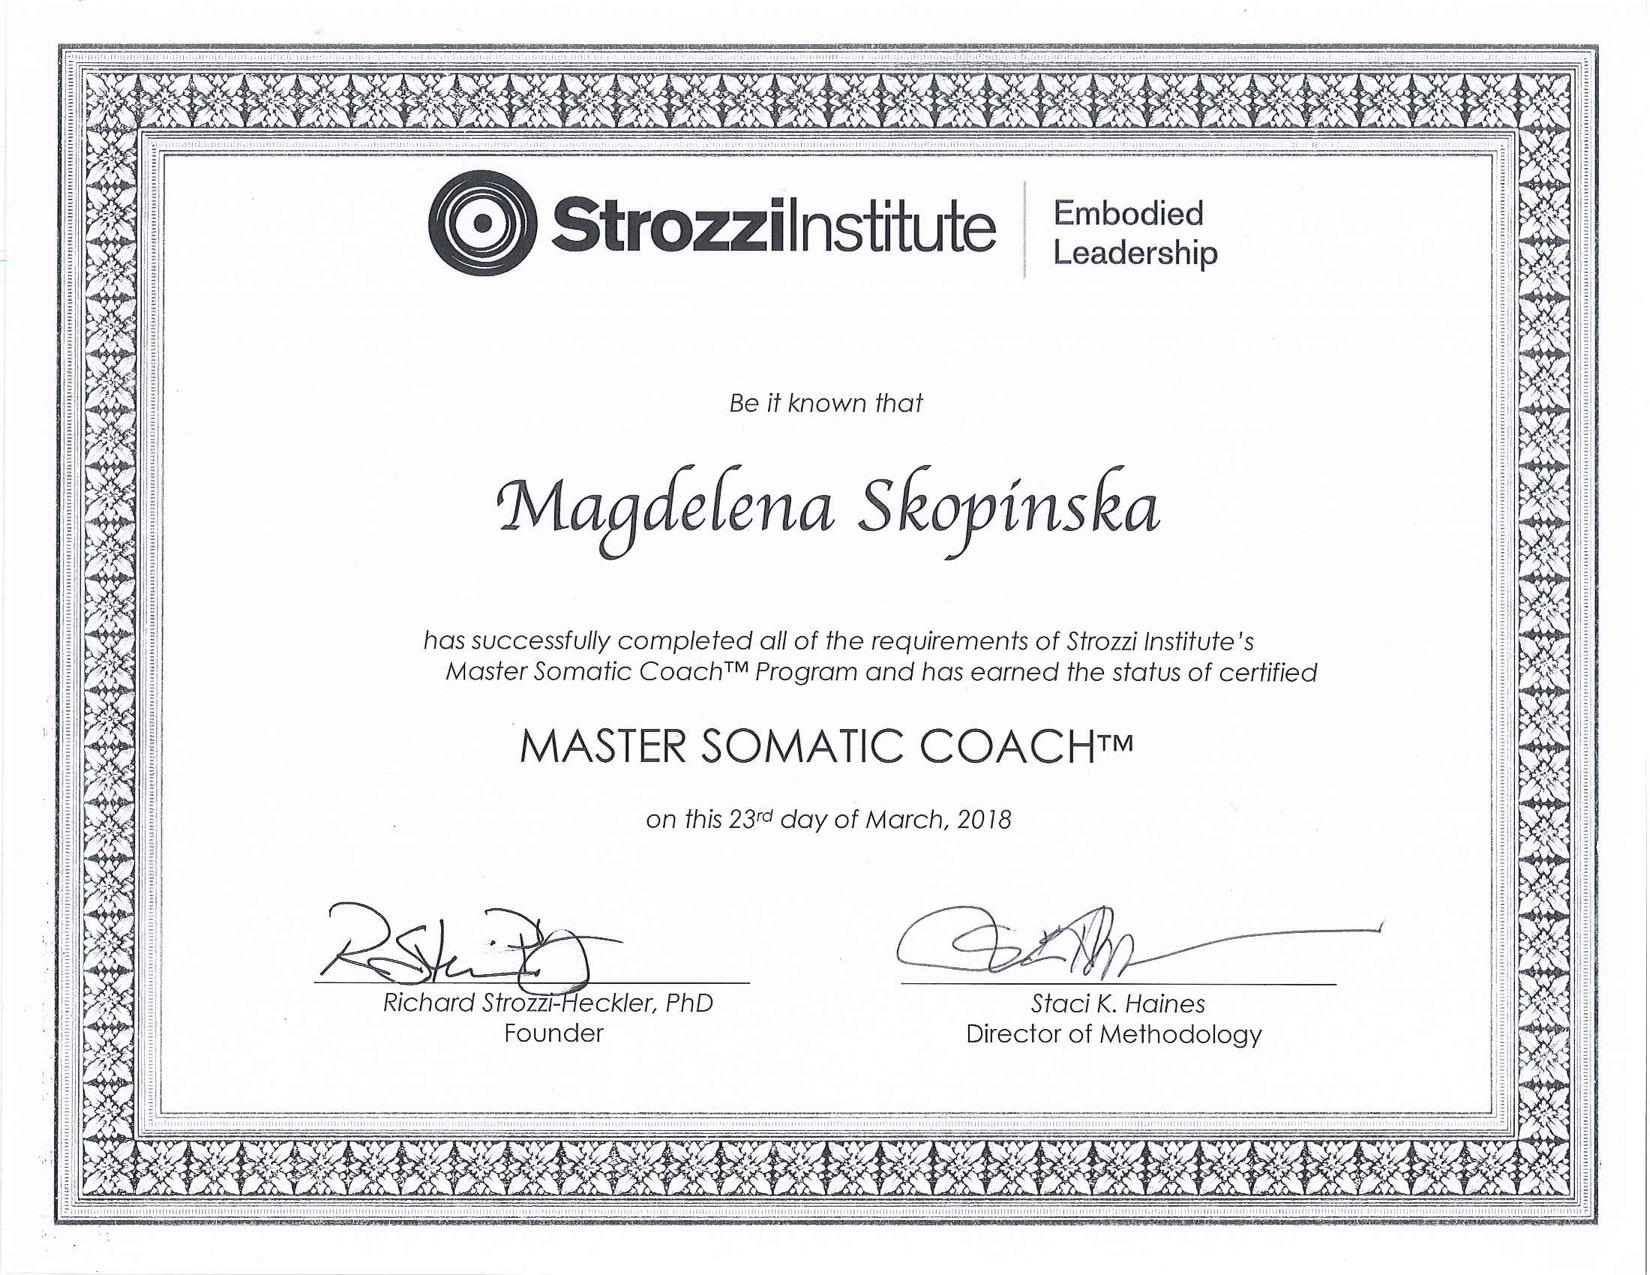 Master Somatic Coach Magdalena Skopinska